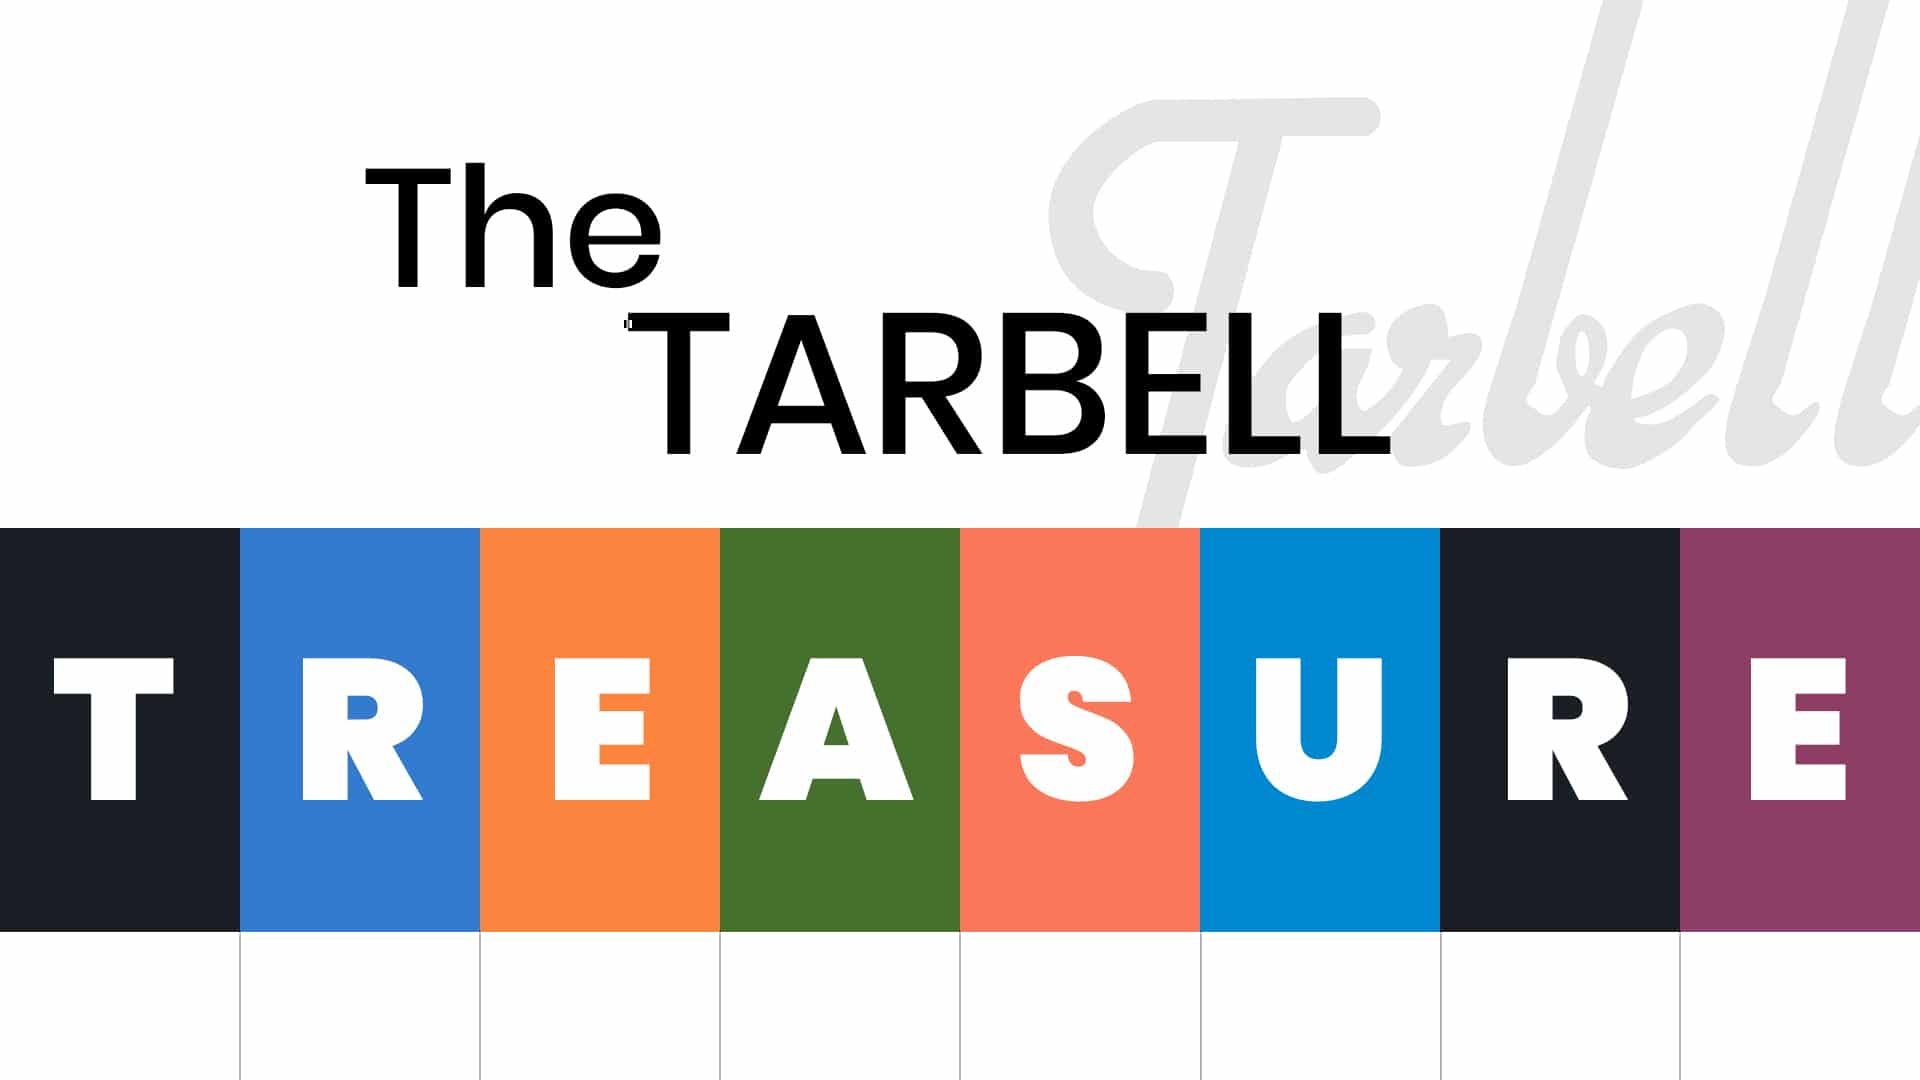 The Tarbell Treasure